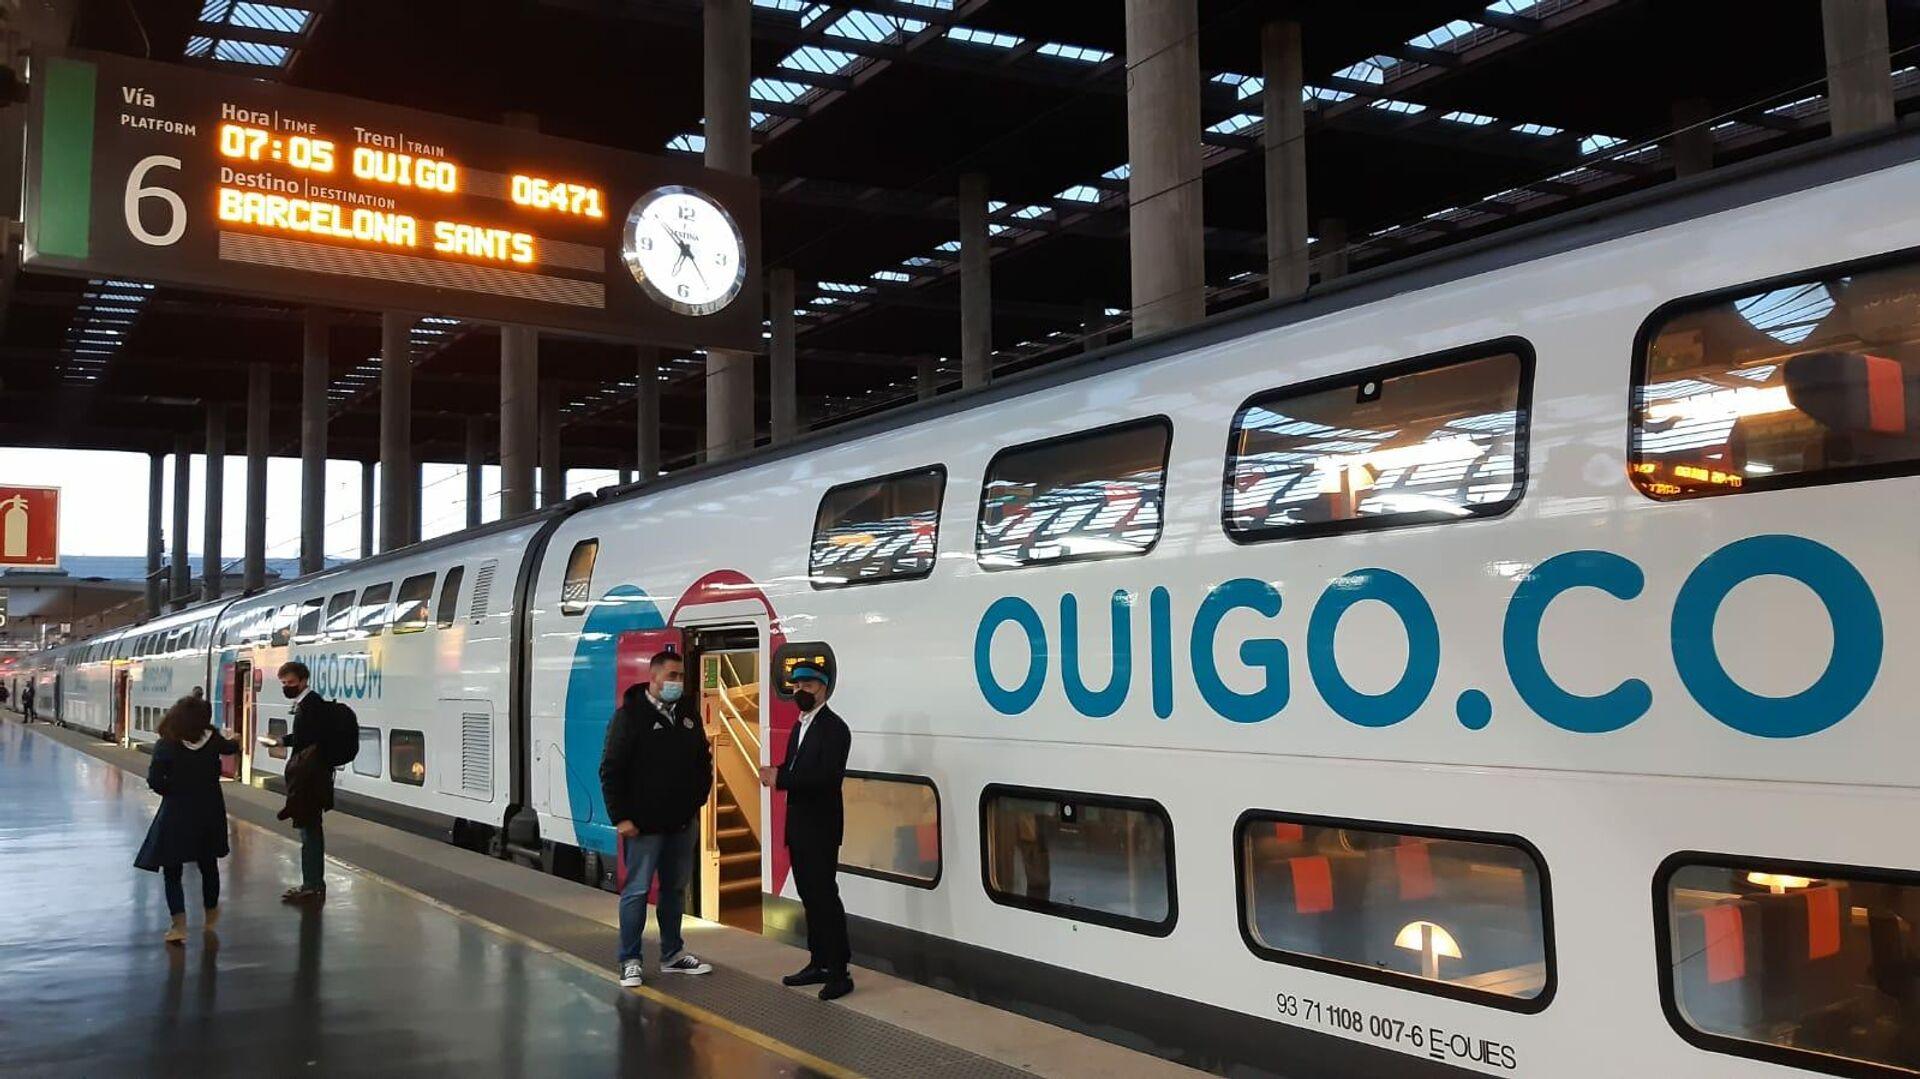 Tren de Ouigo en la estación de Atocha (Madrid) - Sputnik Mundo, 1920, 10.05.2021